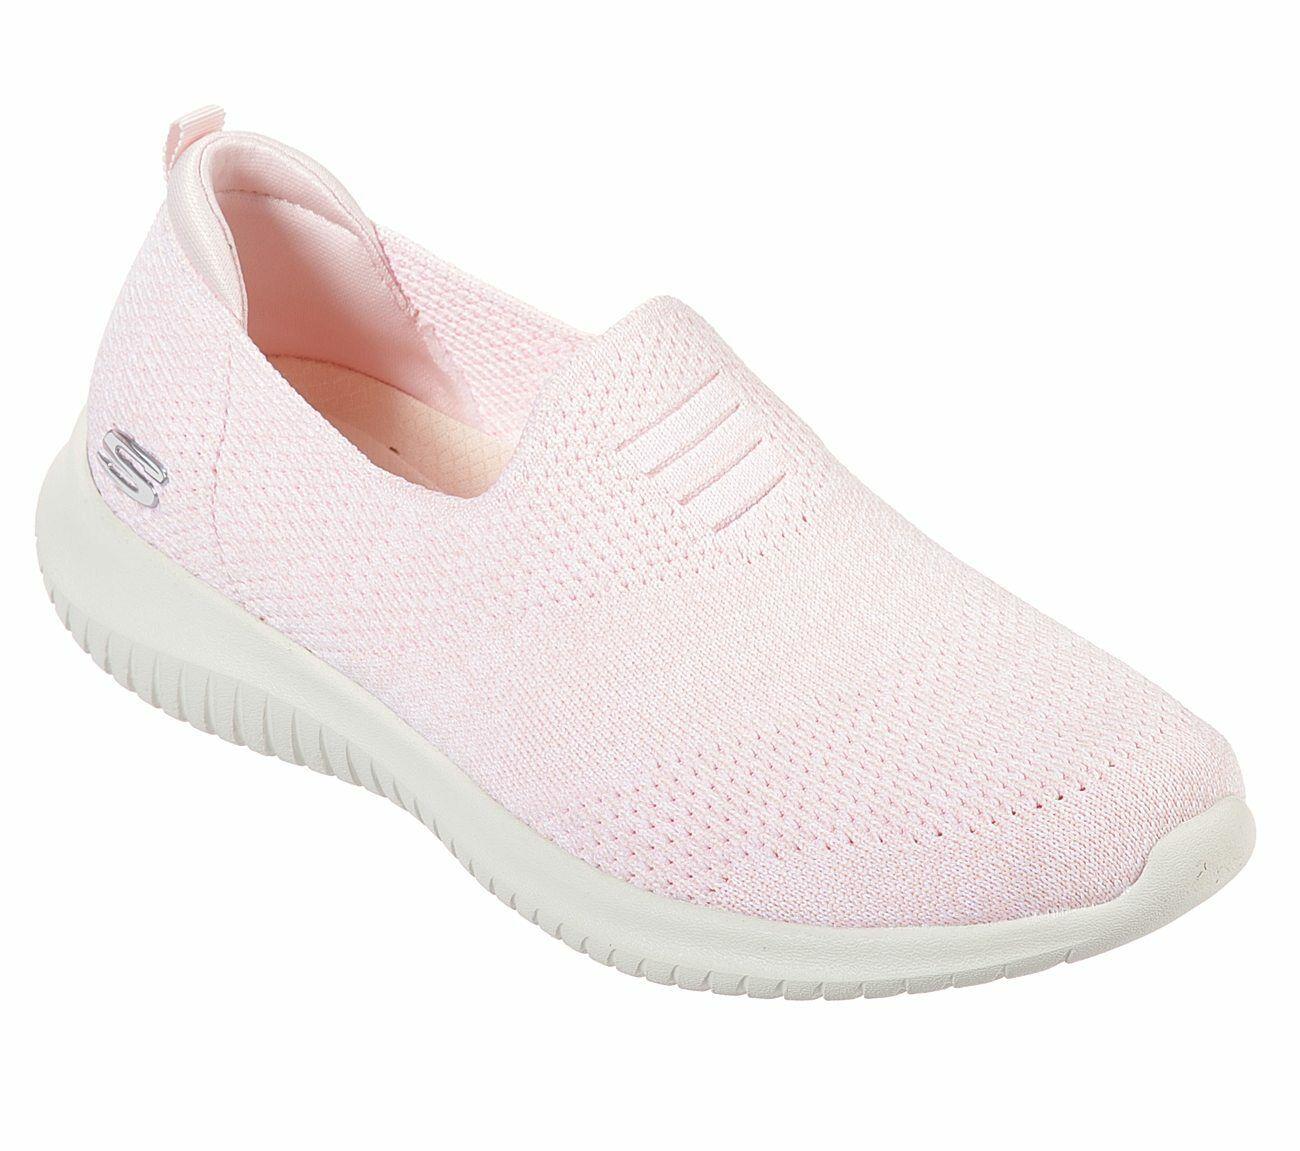 Skechers Chaussures Femme Baskets-Ultra Flex harmonieux - 16106 ltpk